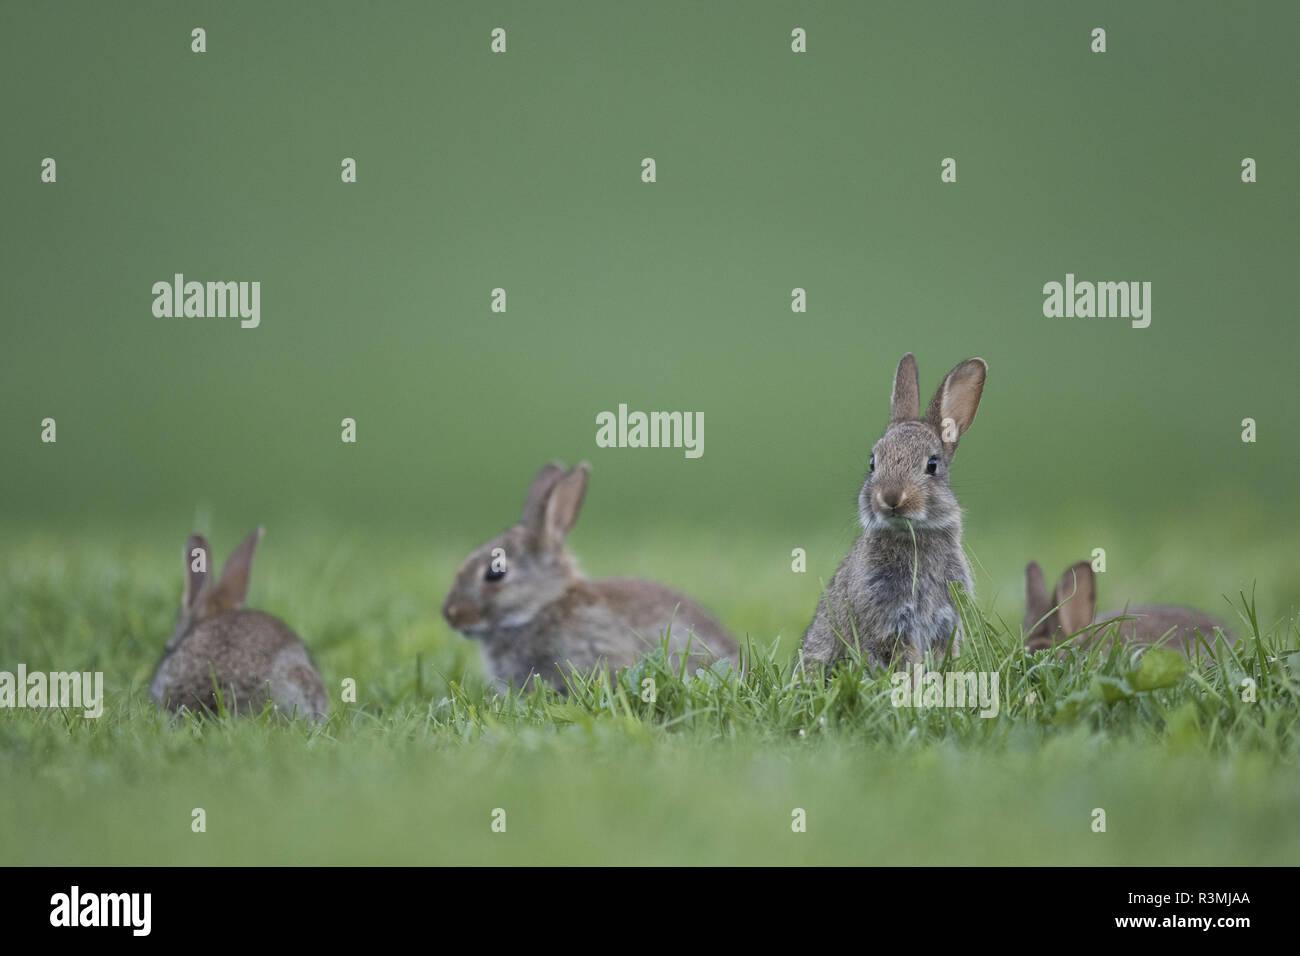 Rabbit (Oryctolagus cuniculus) juveniles, Burgundy, France - Stock Image